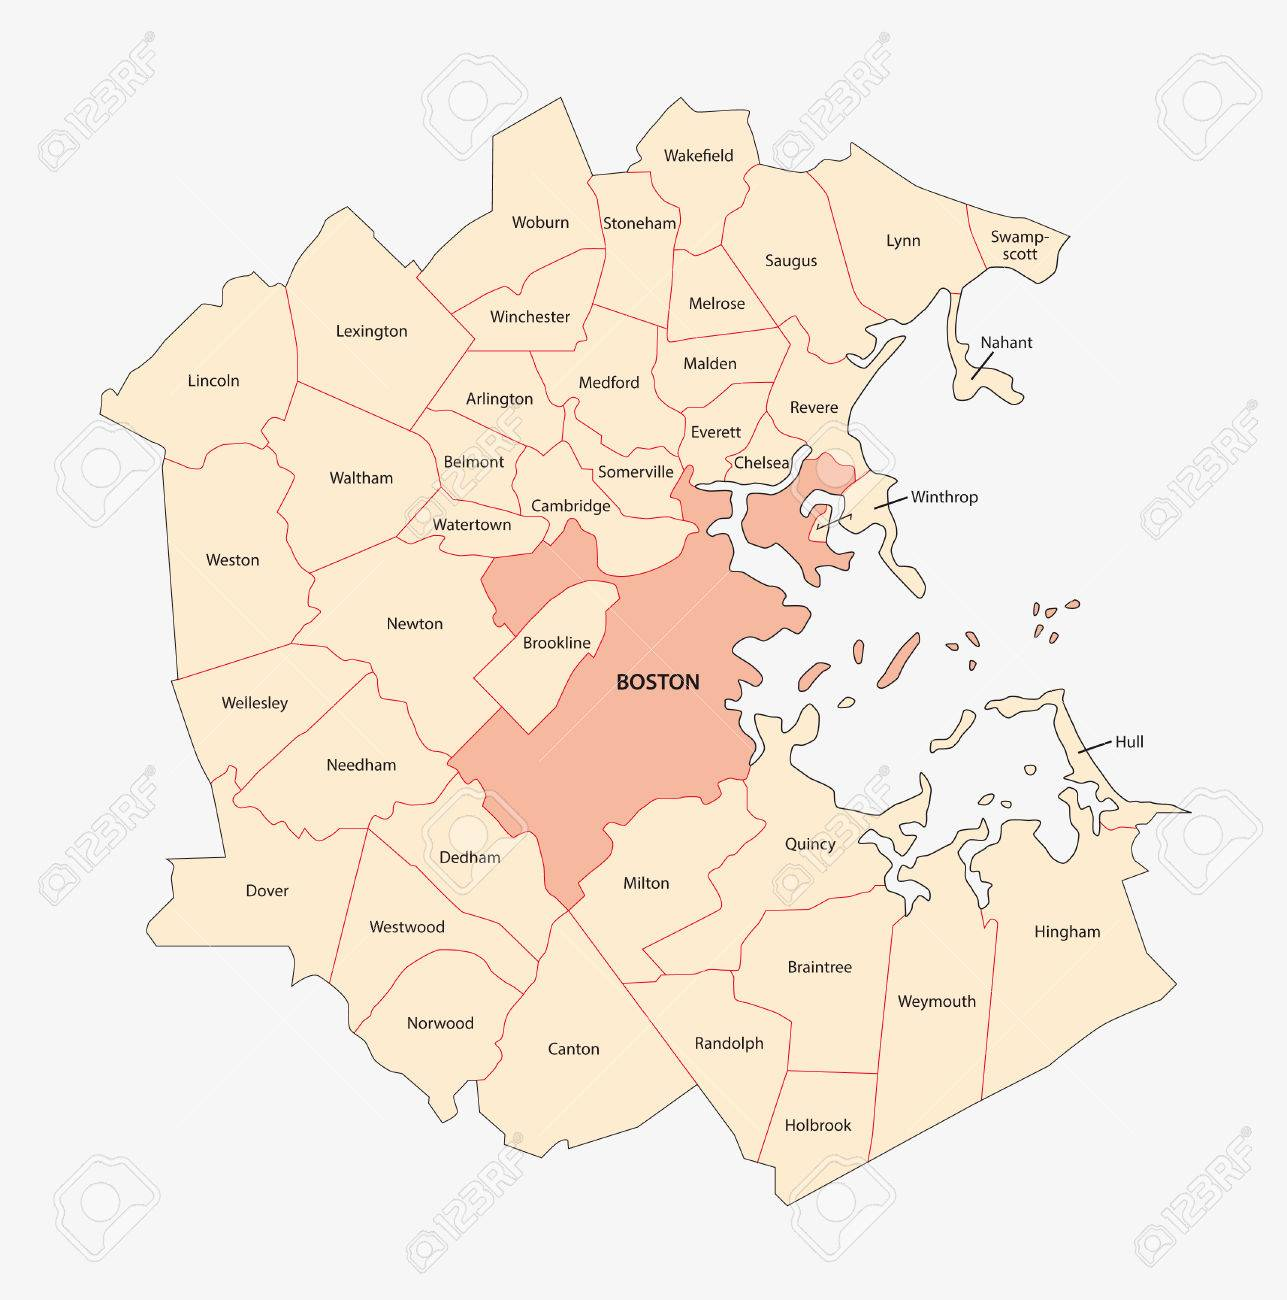 metro-boston area map on greater houston, wareham area map, fl area map, new england map, cape cod map, washington metropolitan area, new york metropolitan area, waltham area map, hartford map, braintree area map, dauphin island area map, chicago area map, norfolk county, gary area map, alpharetta area map, reston area map, dallas/fort worth metroplex, rhode island area map, city area map, delaware valley, essex county, massachusetts map, brighton ma area map, seattle area map, middlesex county, decatur area map, barrington area map, back bay, odessa area map, south shore, atlanta metropolitan area,